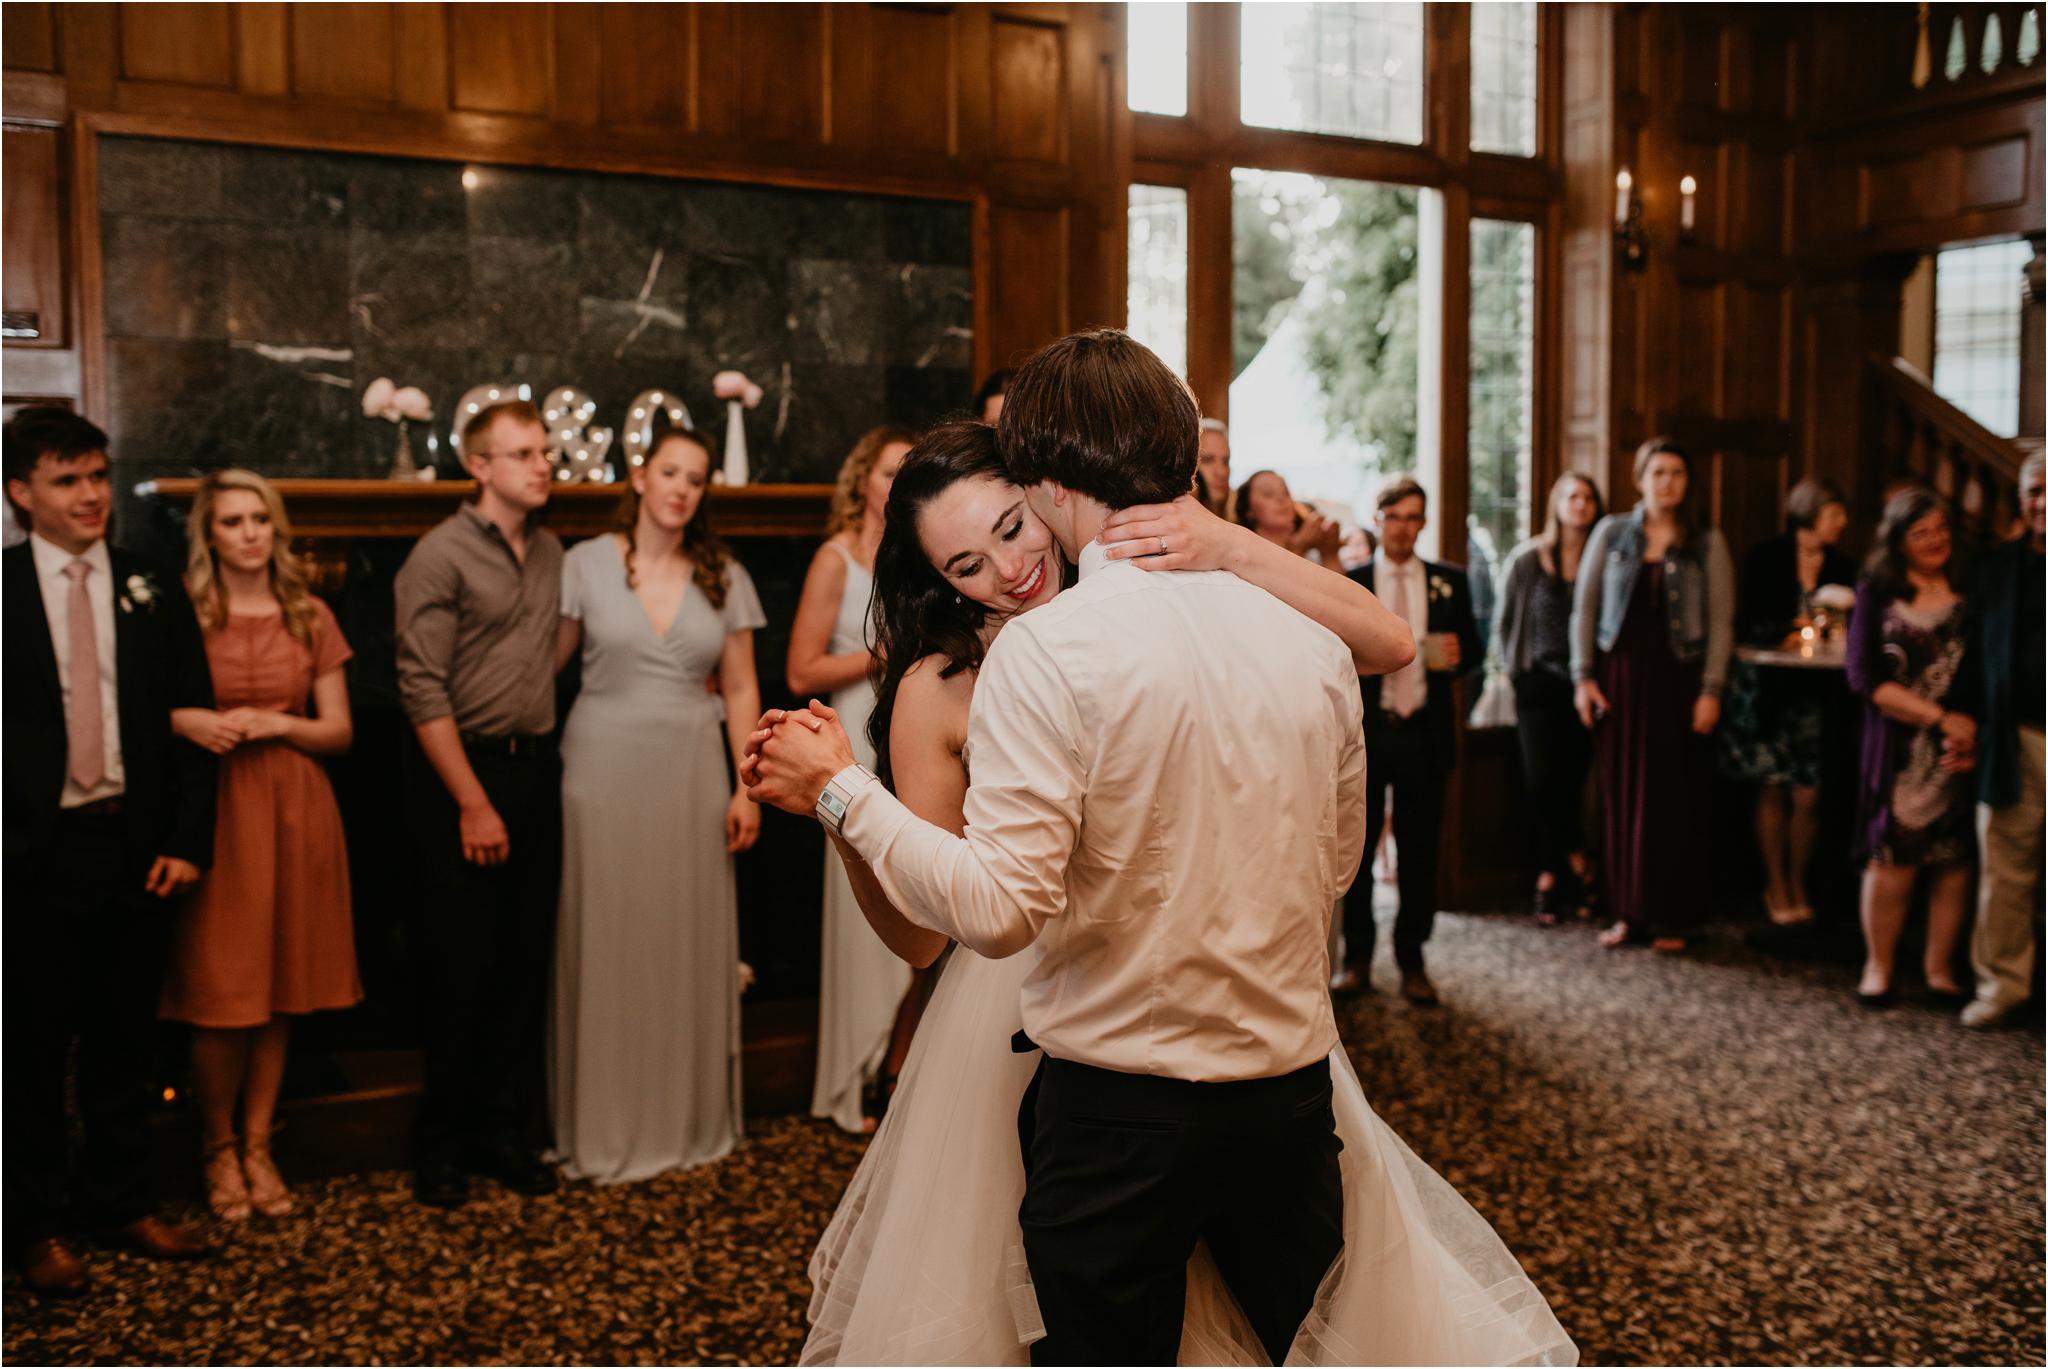 chance-and-ondrea-lairmont-manor-wedding-seattle-photographer-129.jpg